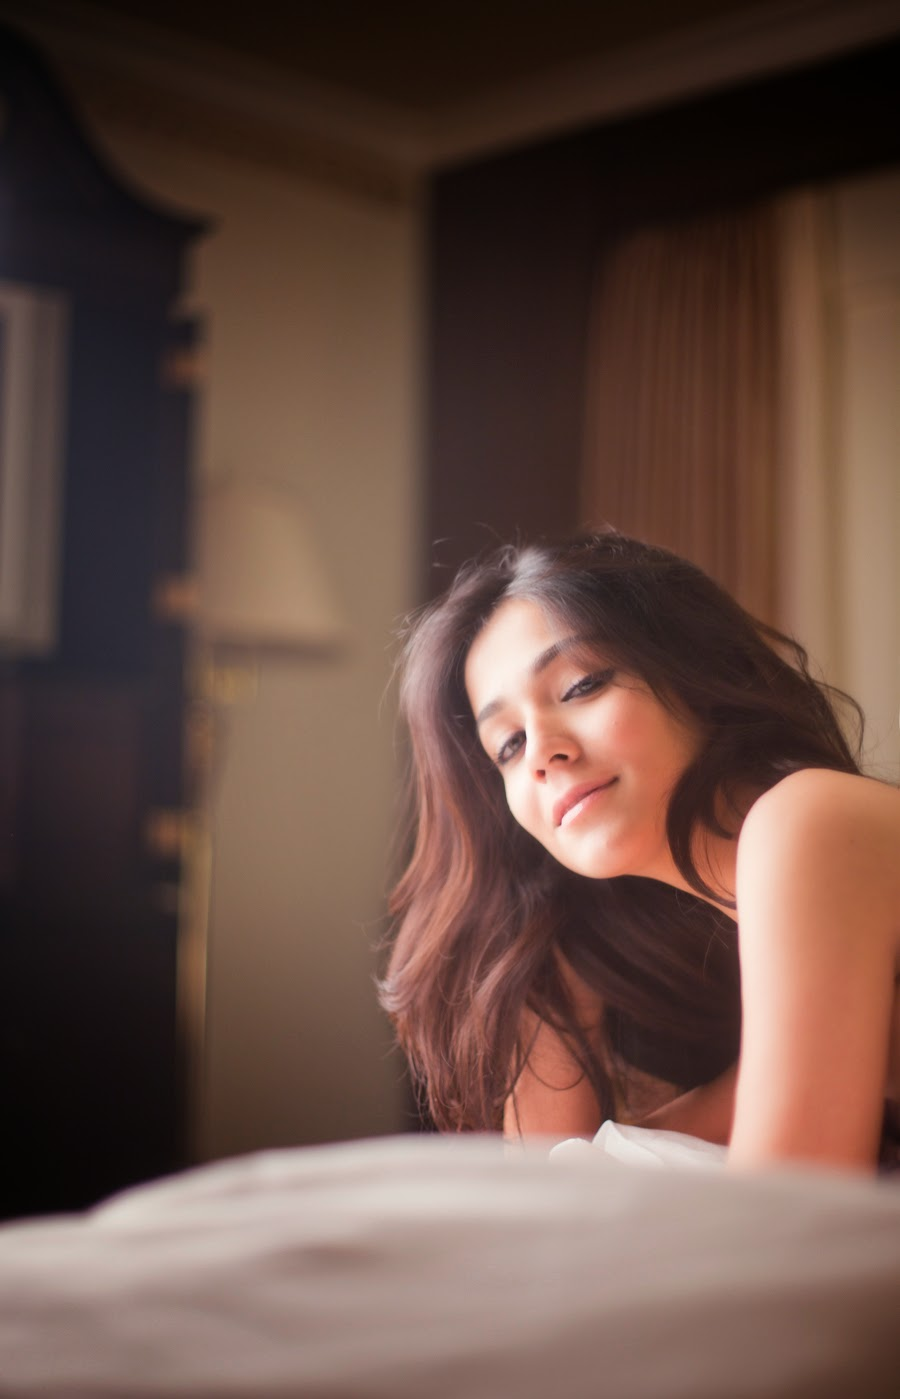 'Sher' actress Humaima Malik's HD Pictures, Photo Shoot & Wallpapers